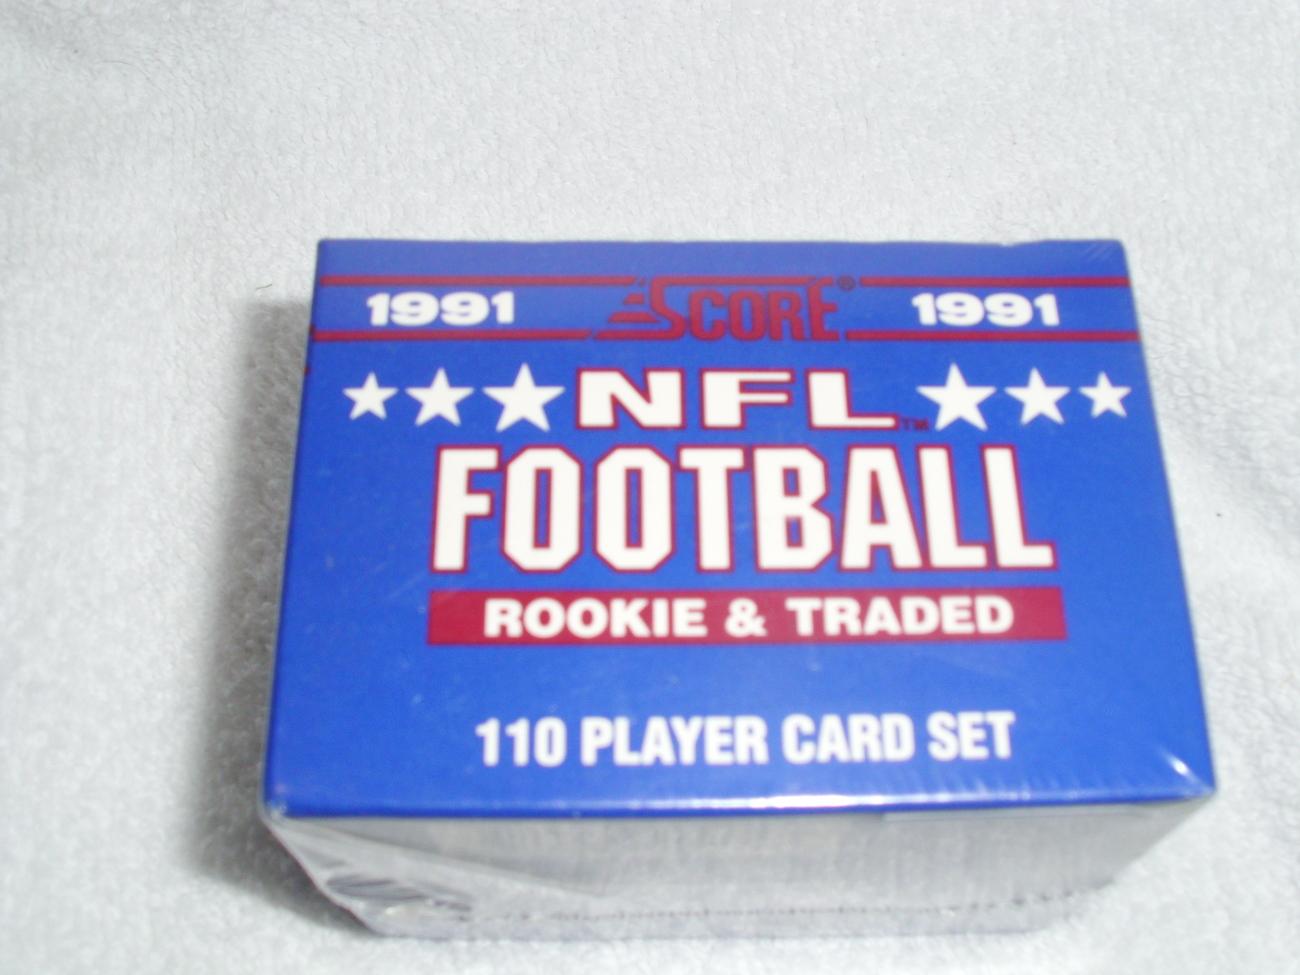 NFL Player Card Set